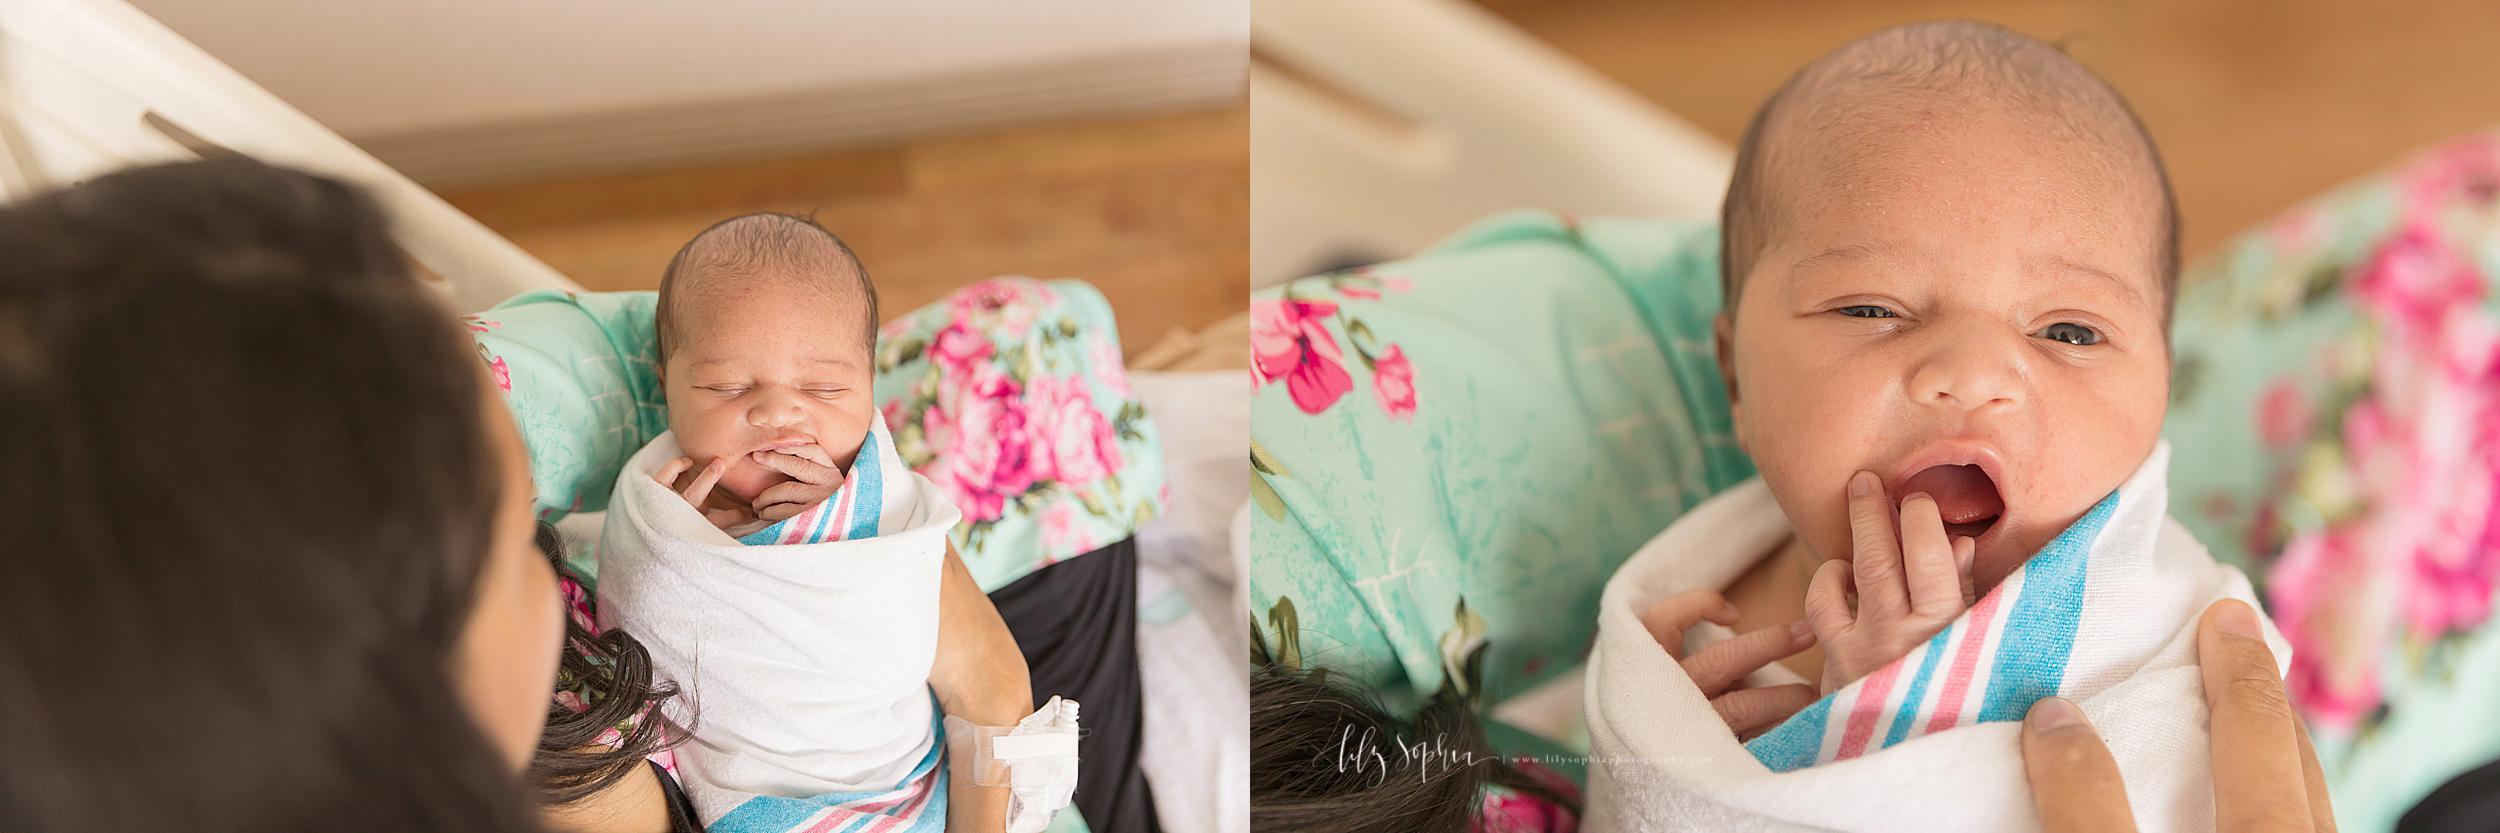 atlanta-midtown-brookhaven-decatur-lily-sophia-photography-photographer-portraits-grant-park-family-atlanta-medical-center-fresh-48-hospital-newborn-photos-lifestyle-big-brothers_0086.jpg